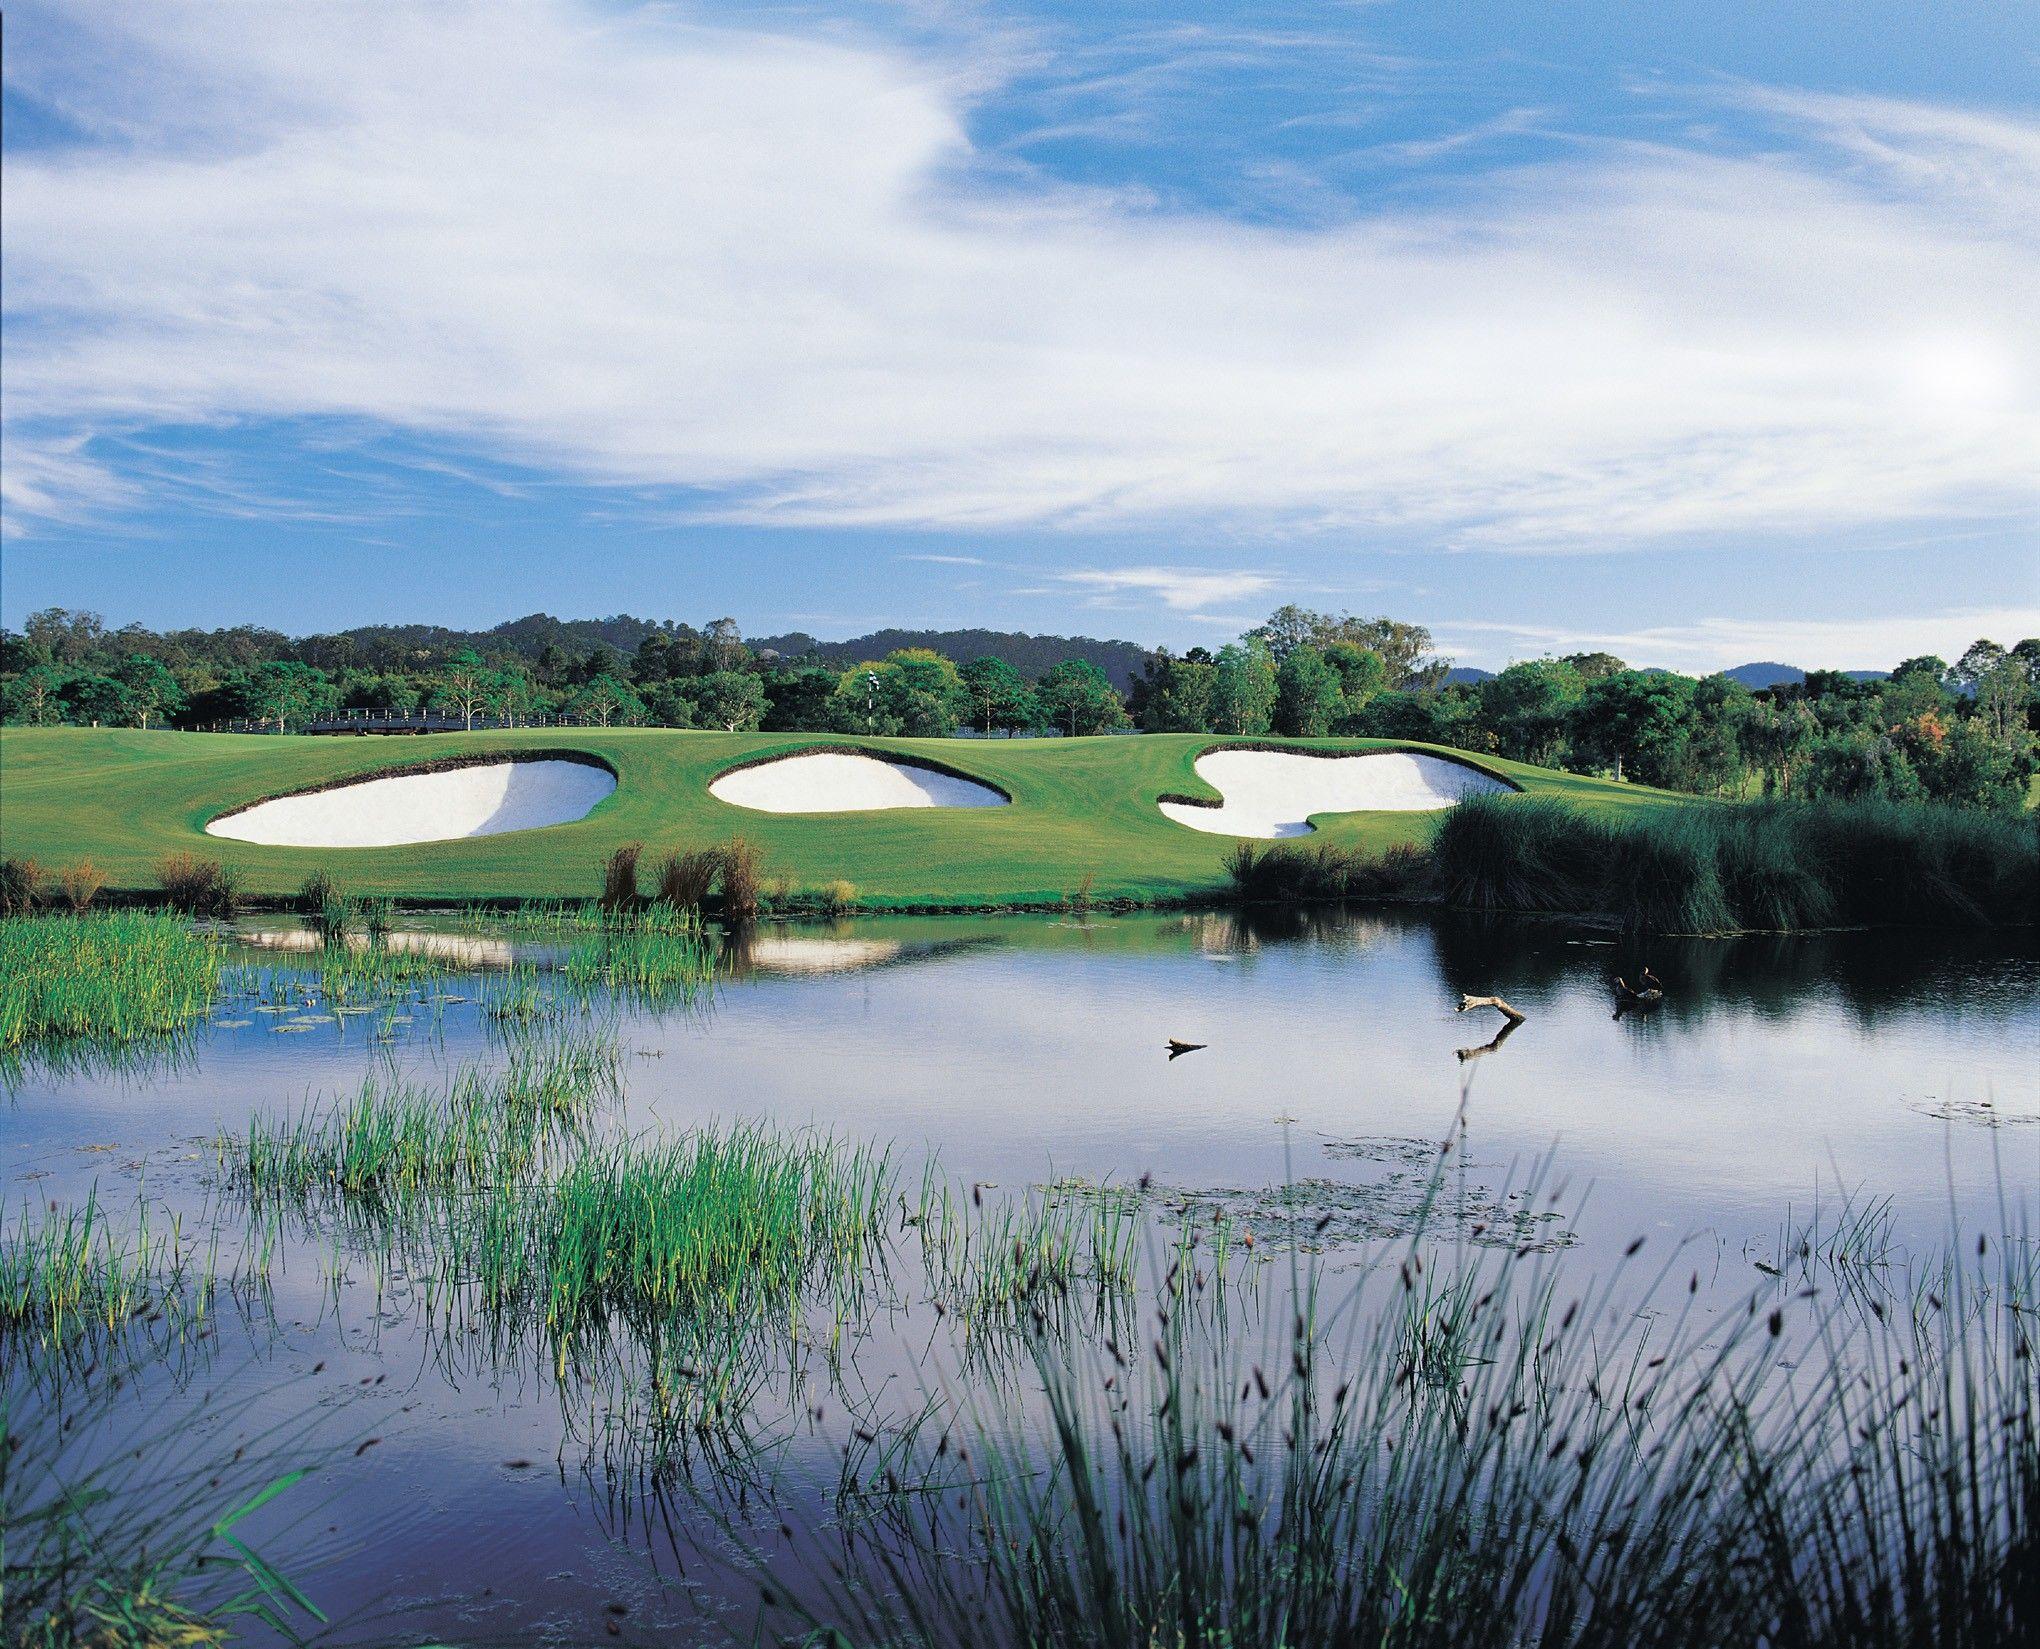 glades golf course queensland - Google Search